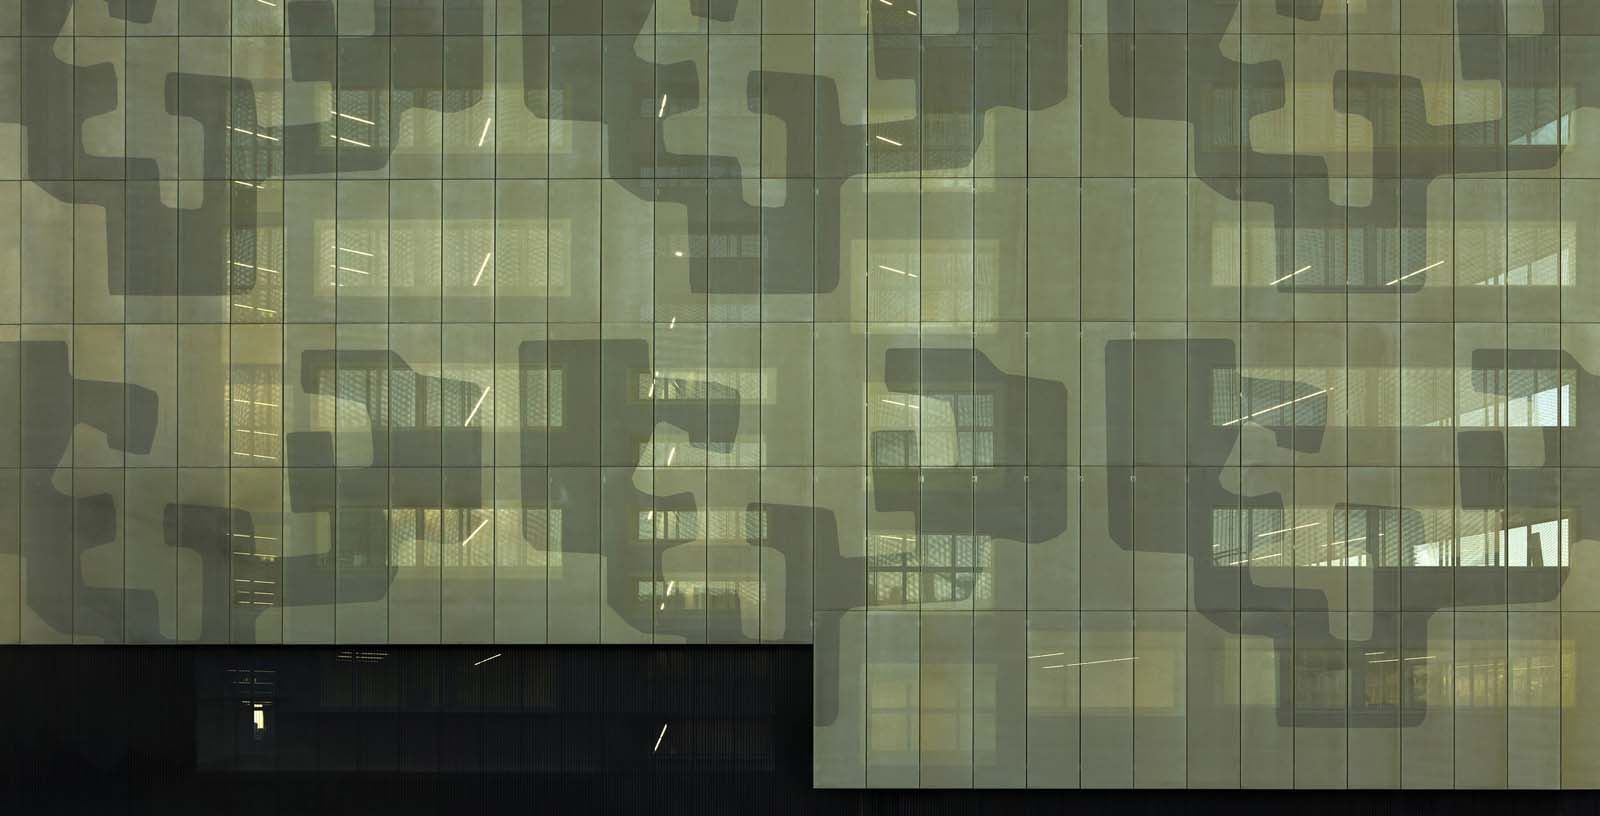 Engineerings_Schools_Building_Bilbao_02_Architecture_IDOM_photos_Aitor_Ortiz